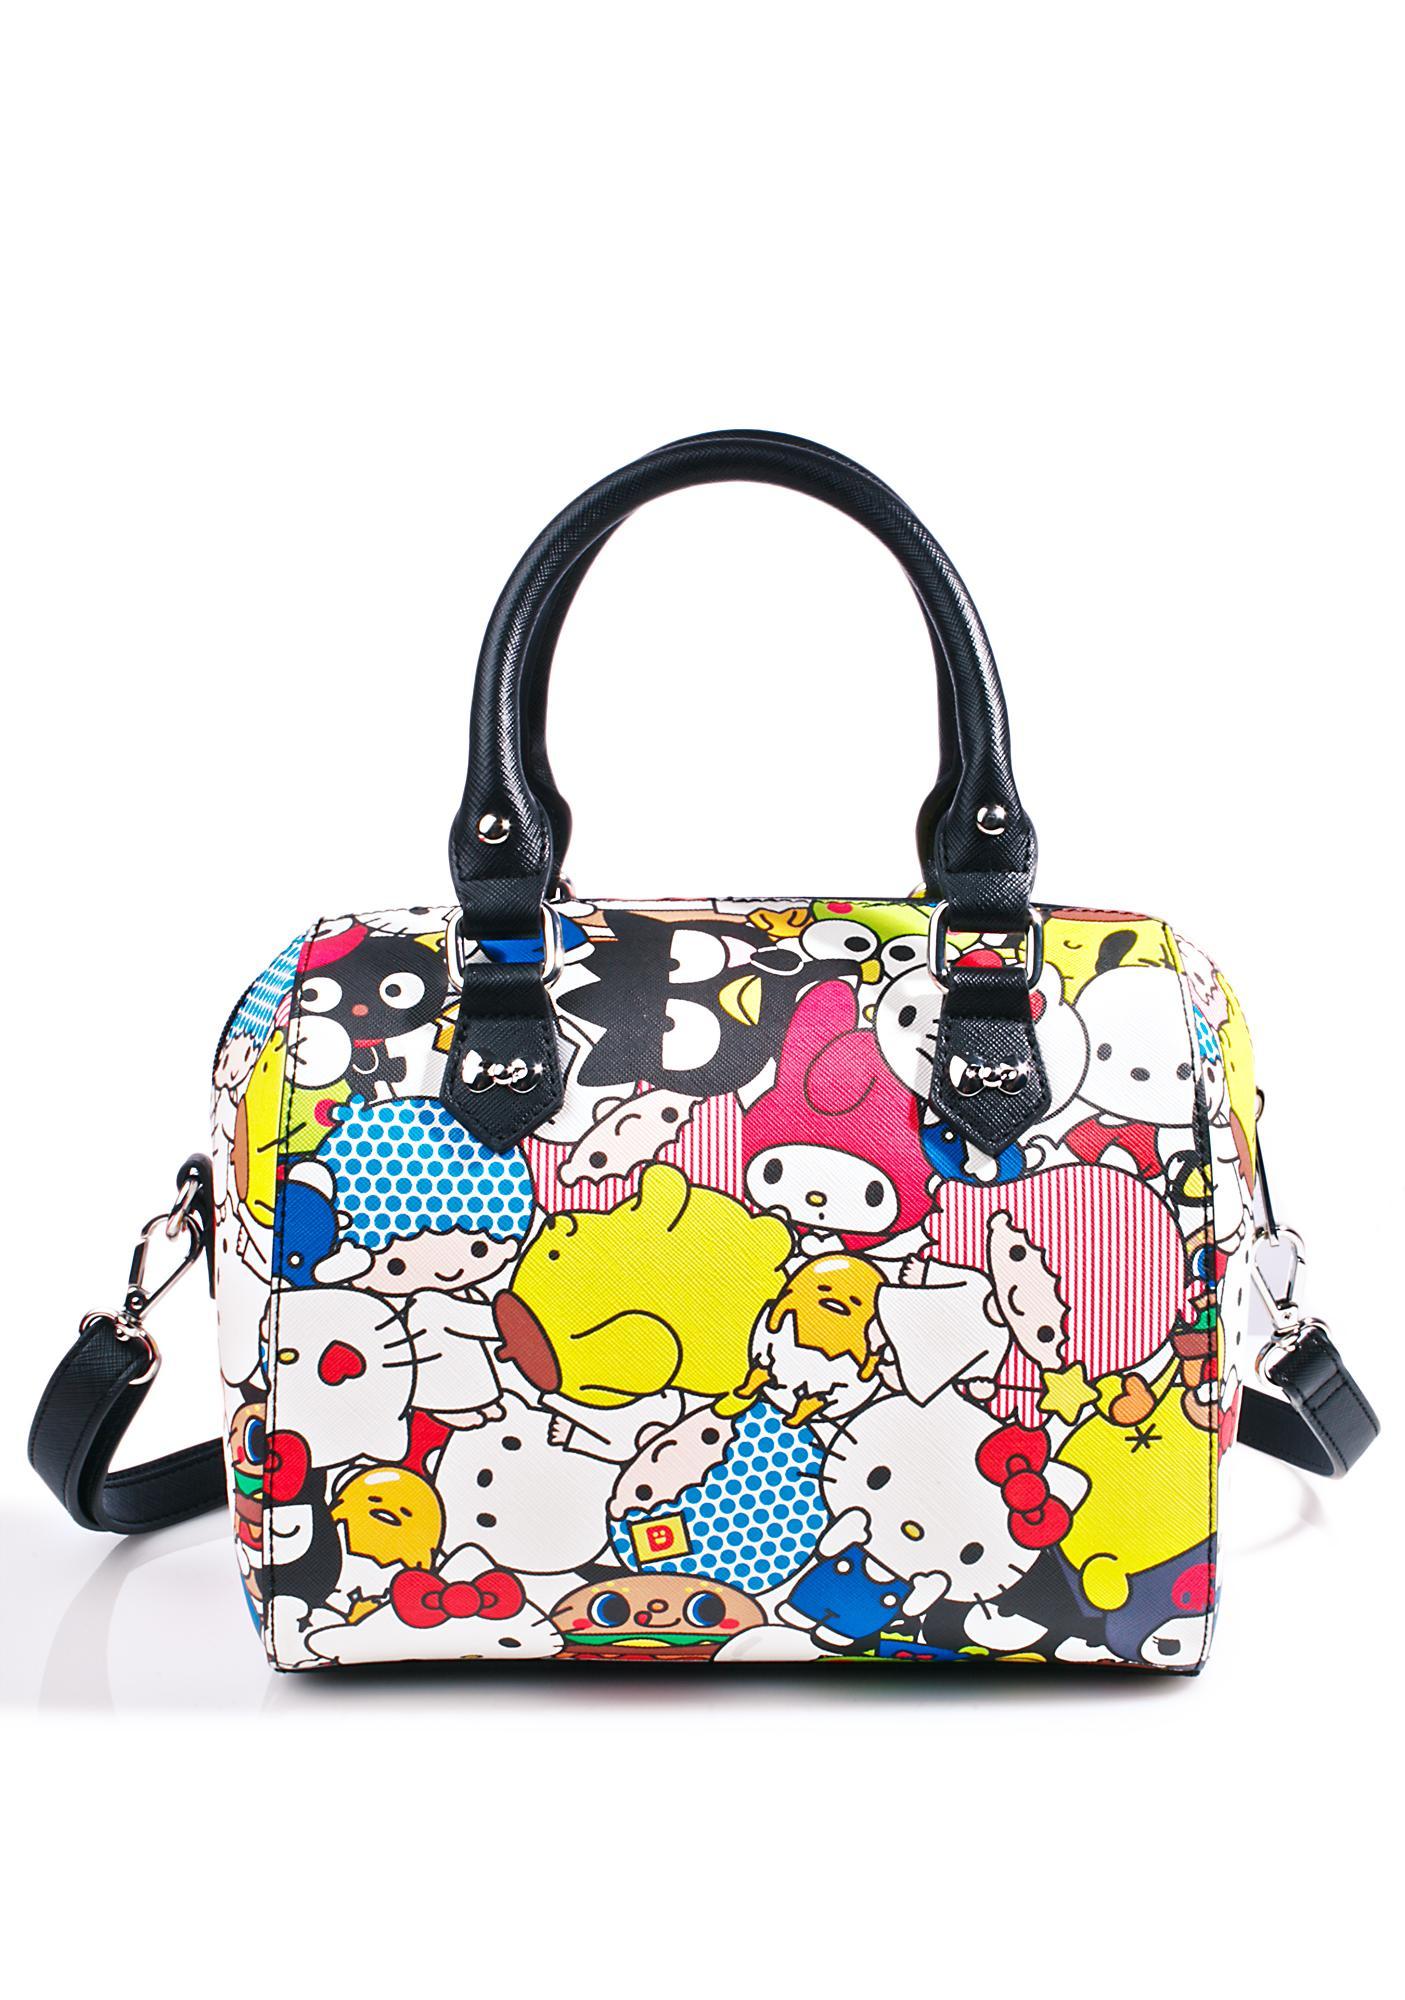 108b905896 ... Loungefly Hello Sanrio Duffle Bag ...